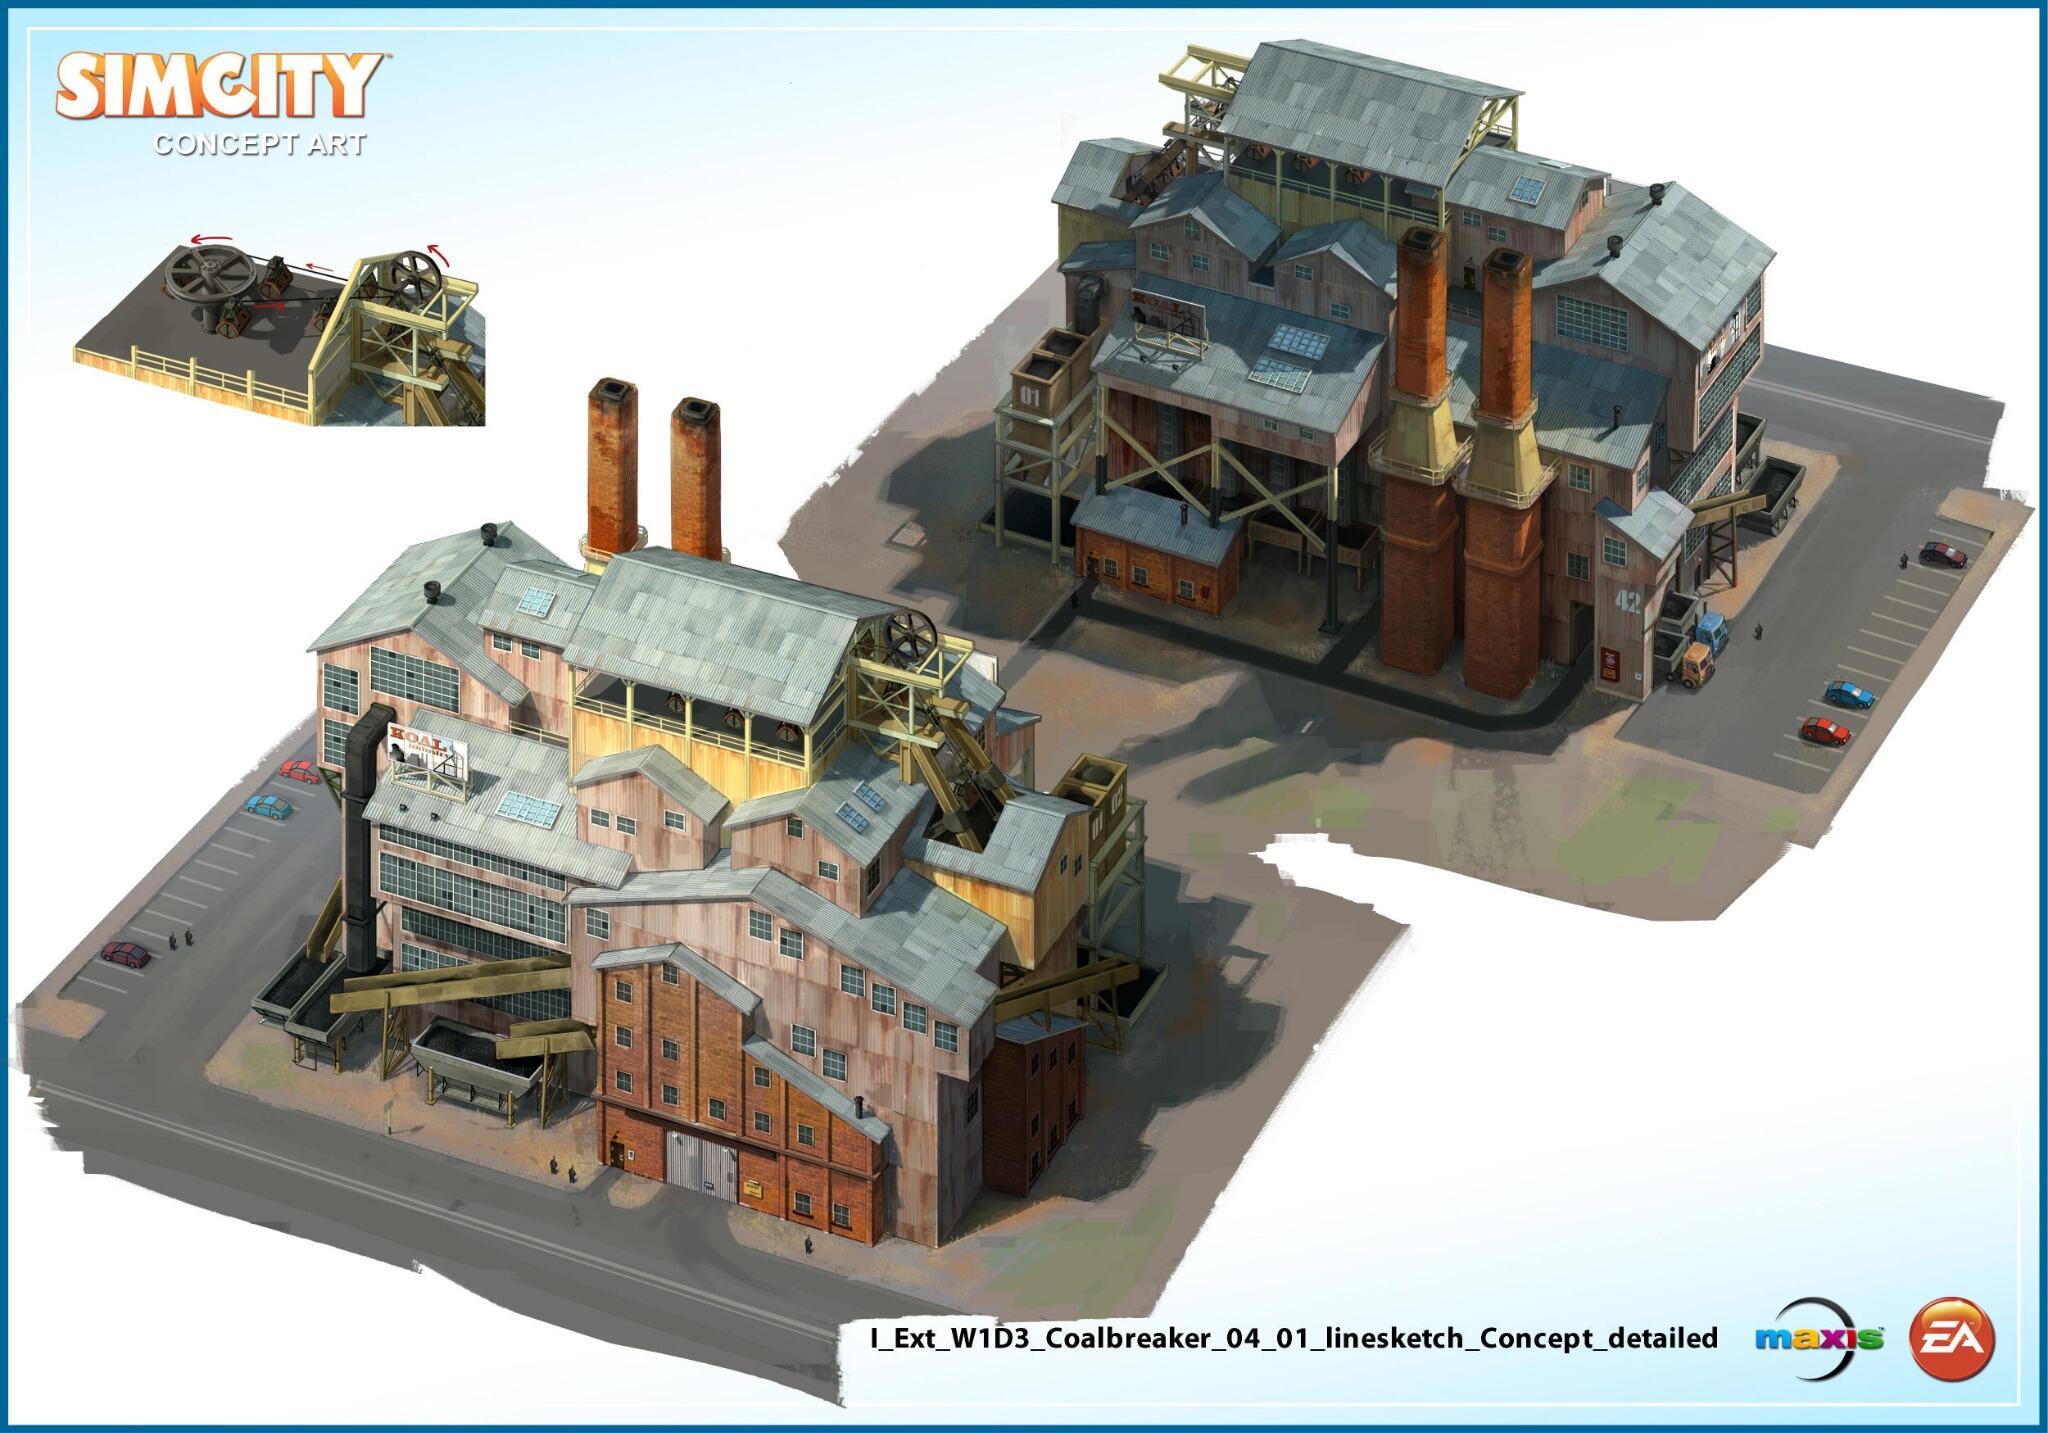 [Imagen]Arte conceptual Simcity (II) Ba6W4e8CQAADYNU